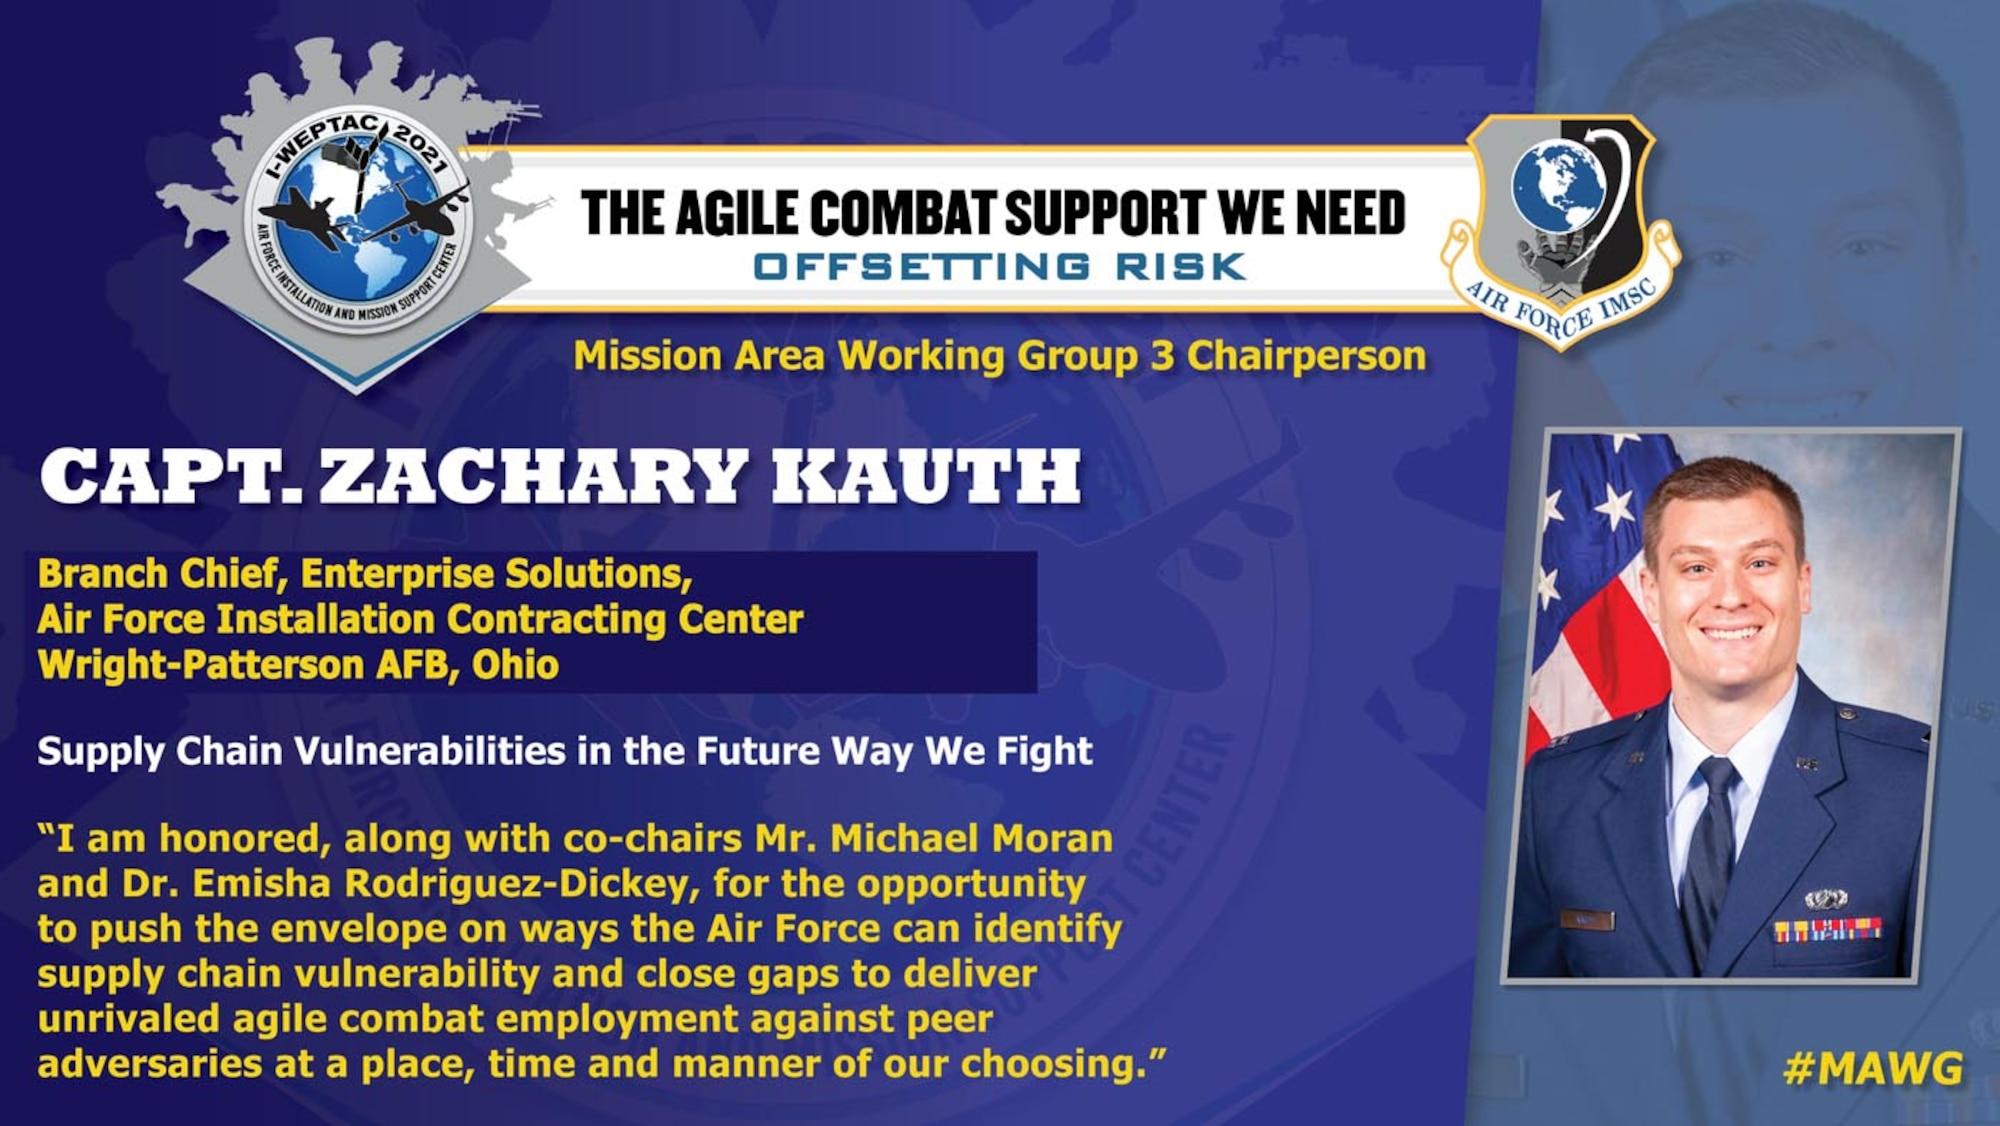 Capt. Zachary Kauth, 2021 I-WEPTAC MAWG Chair 3